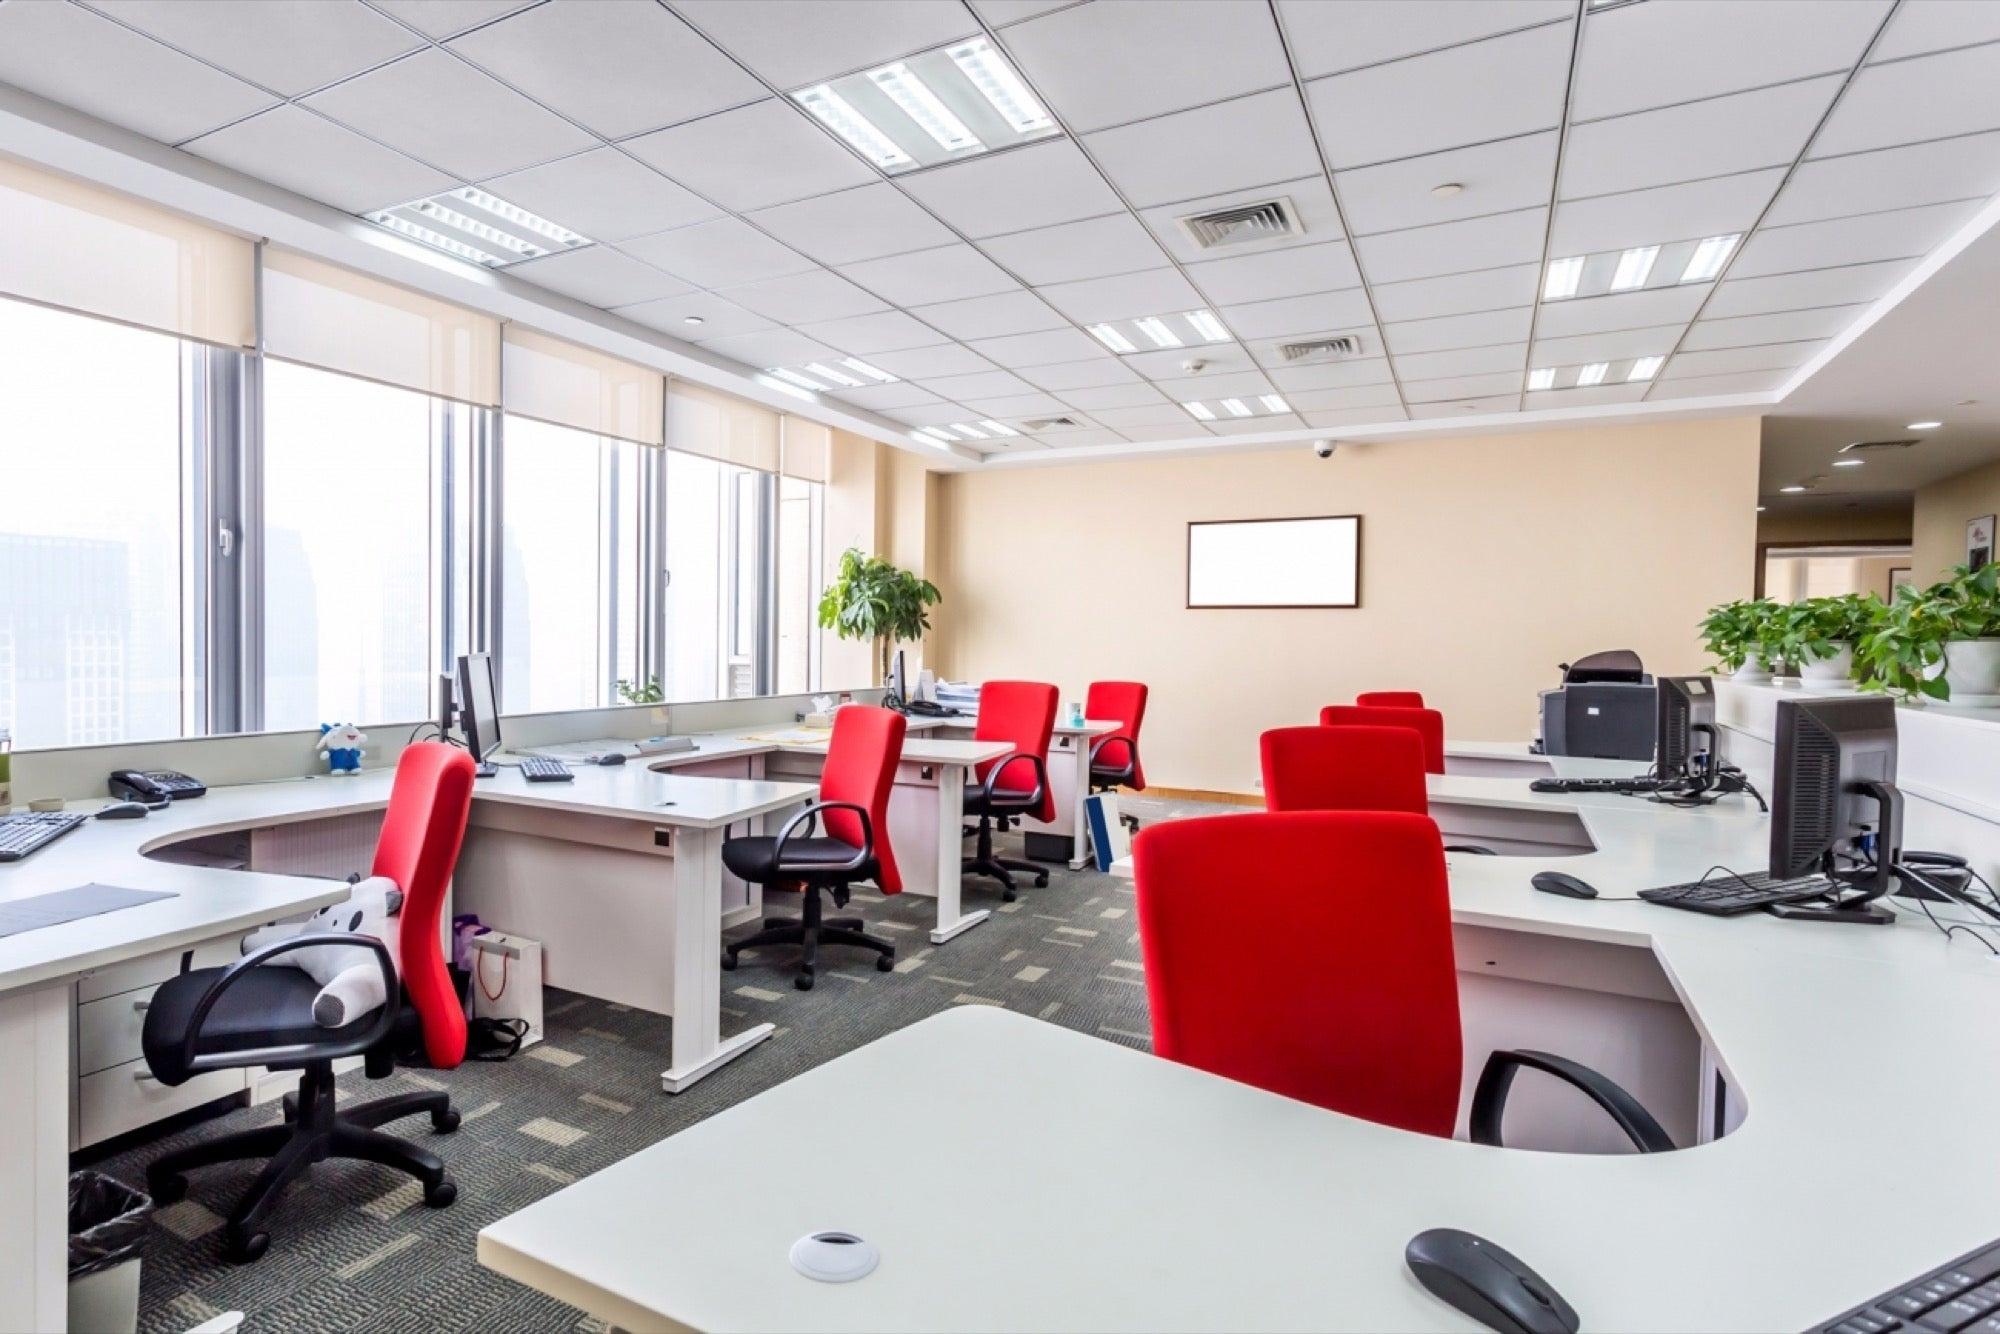 konnikova open office. Konnikova Open Office A